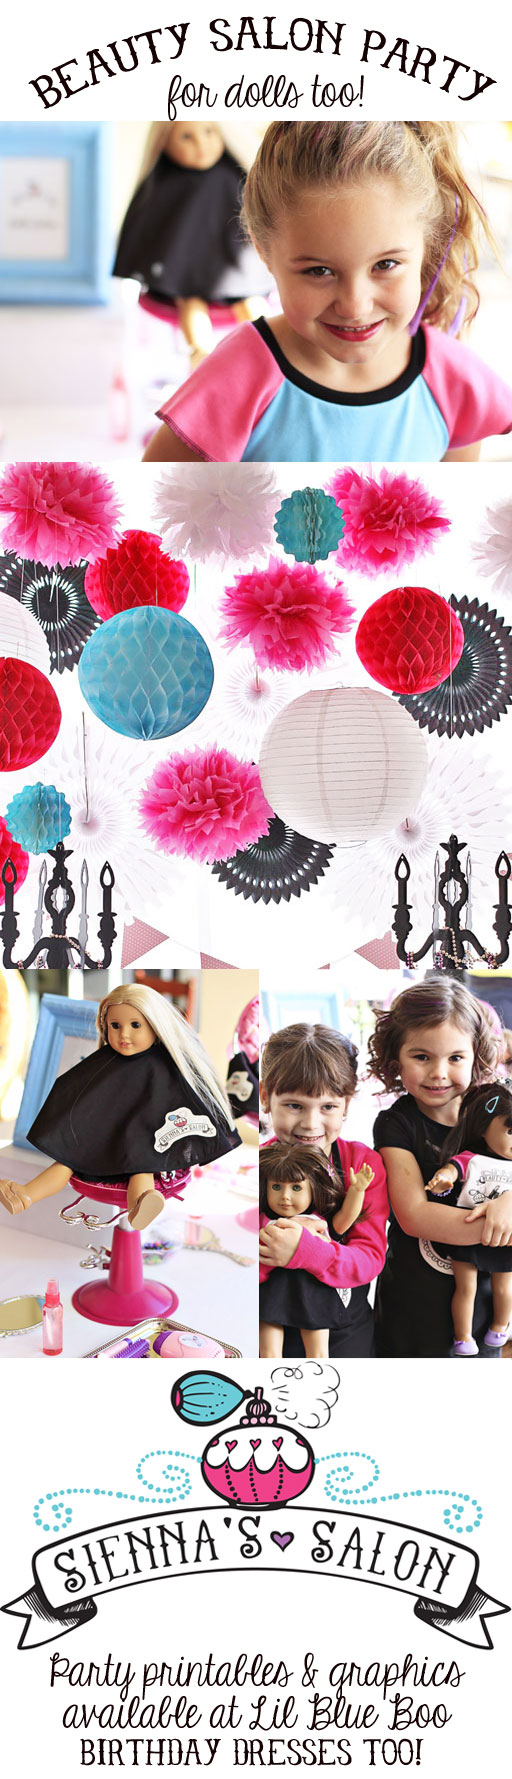 A Beauty Salon Glam Birthday Party with Mini Doll Salon via lilblueboo.com